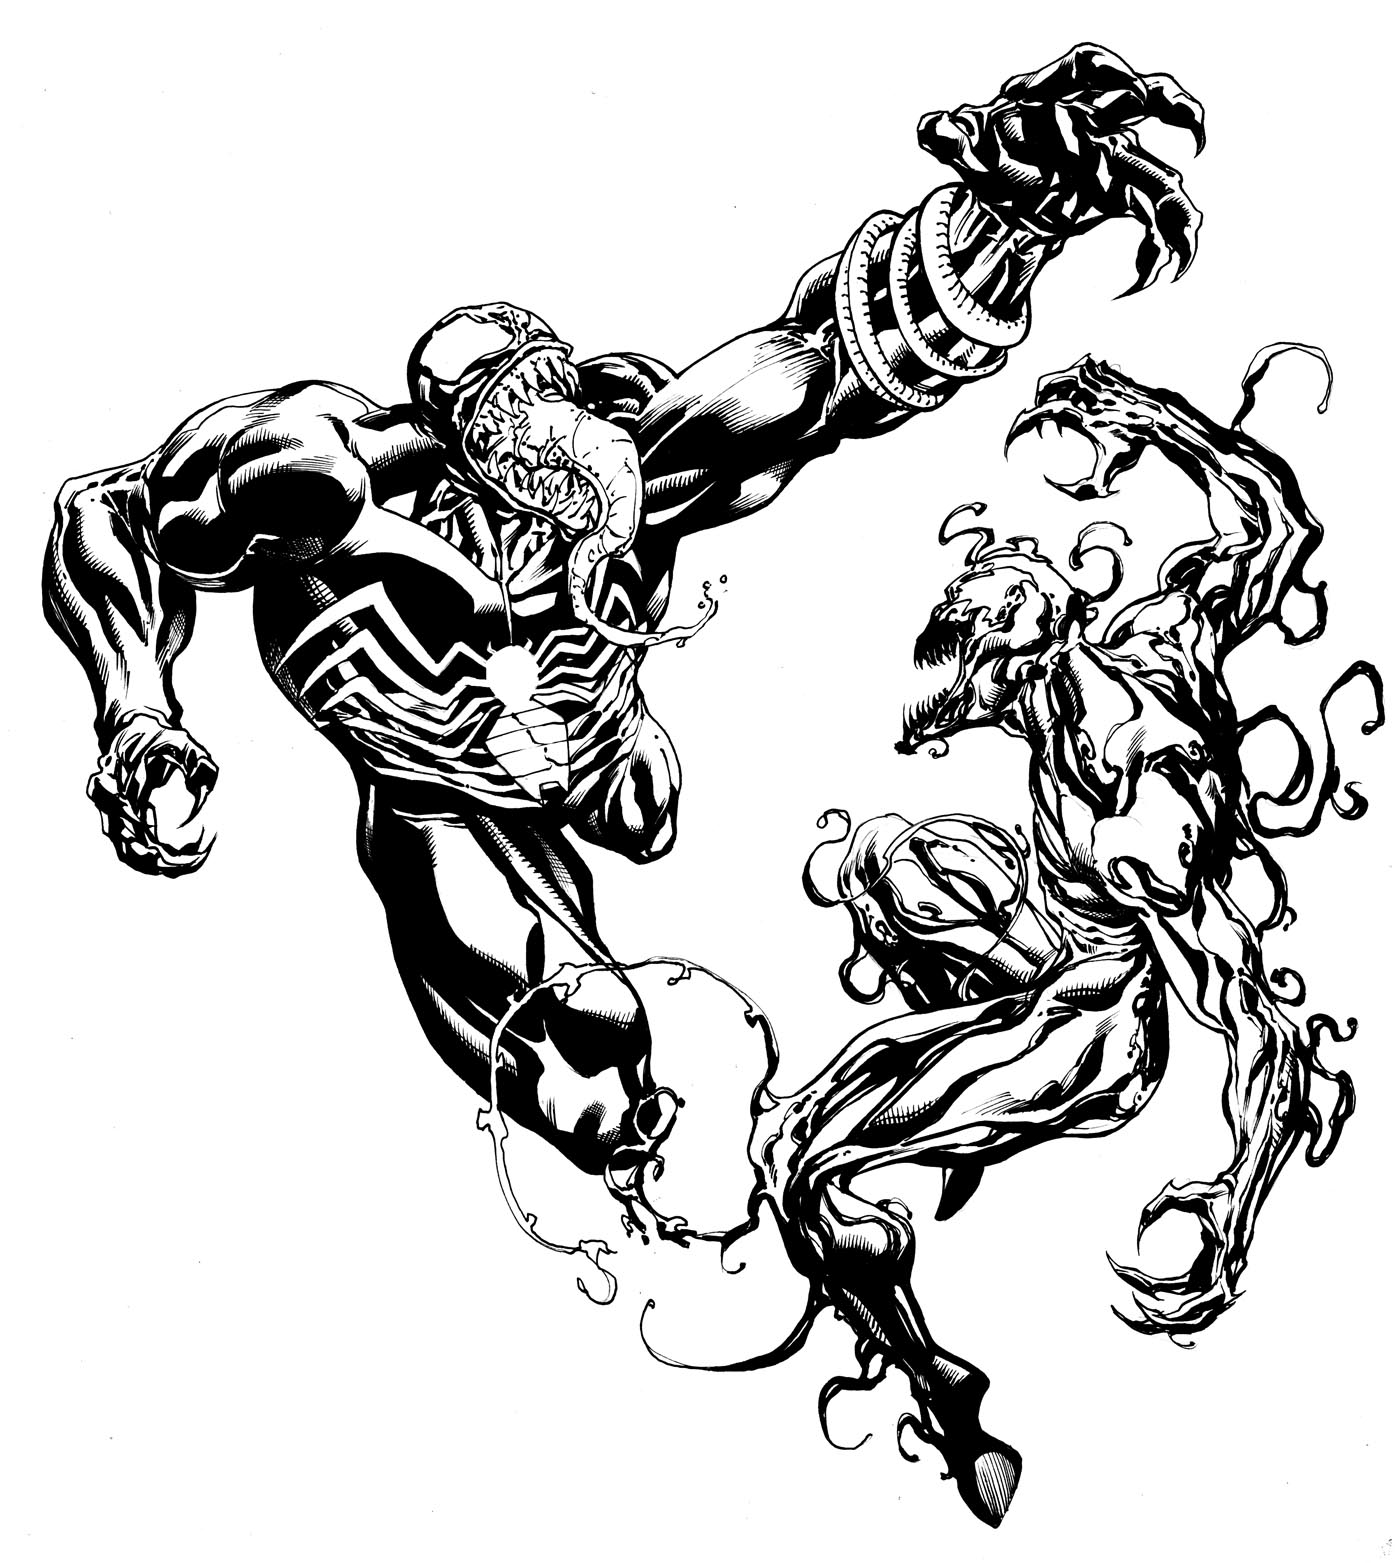 Venom Coloring Pages Lego Venom Spider Marvel Heroes: DeathValley